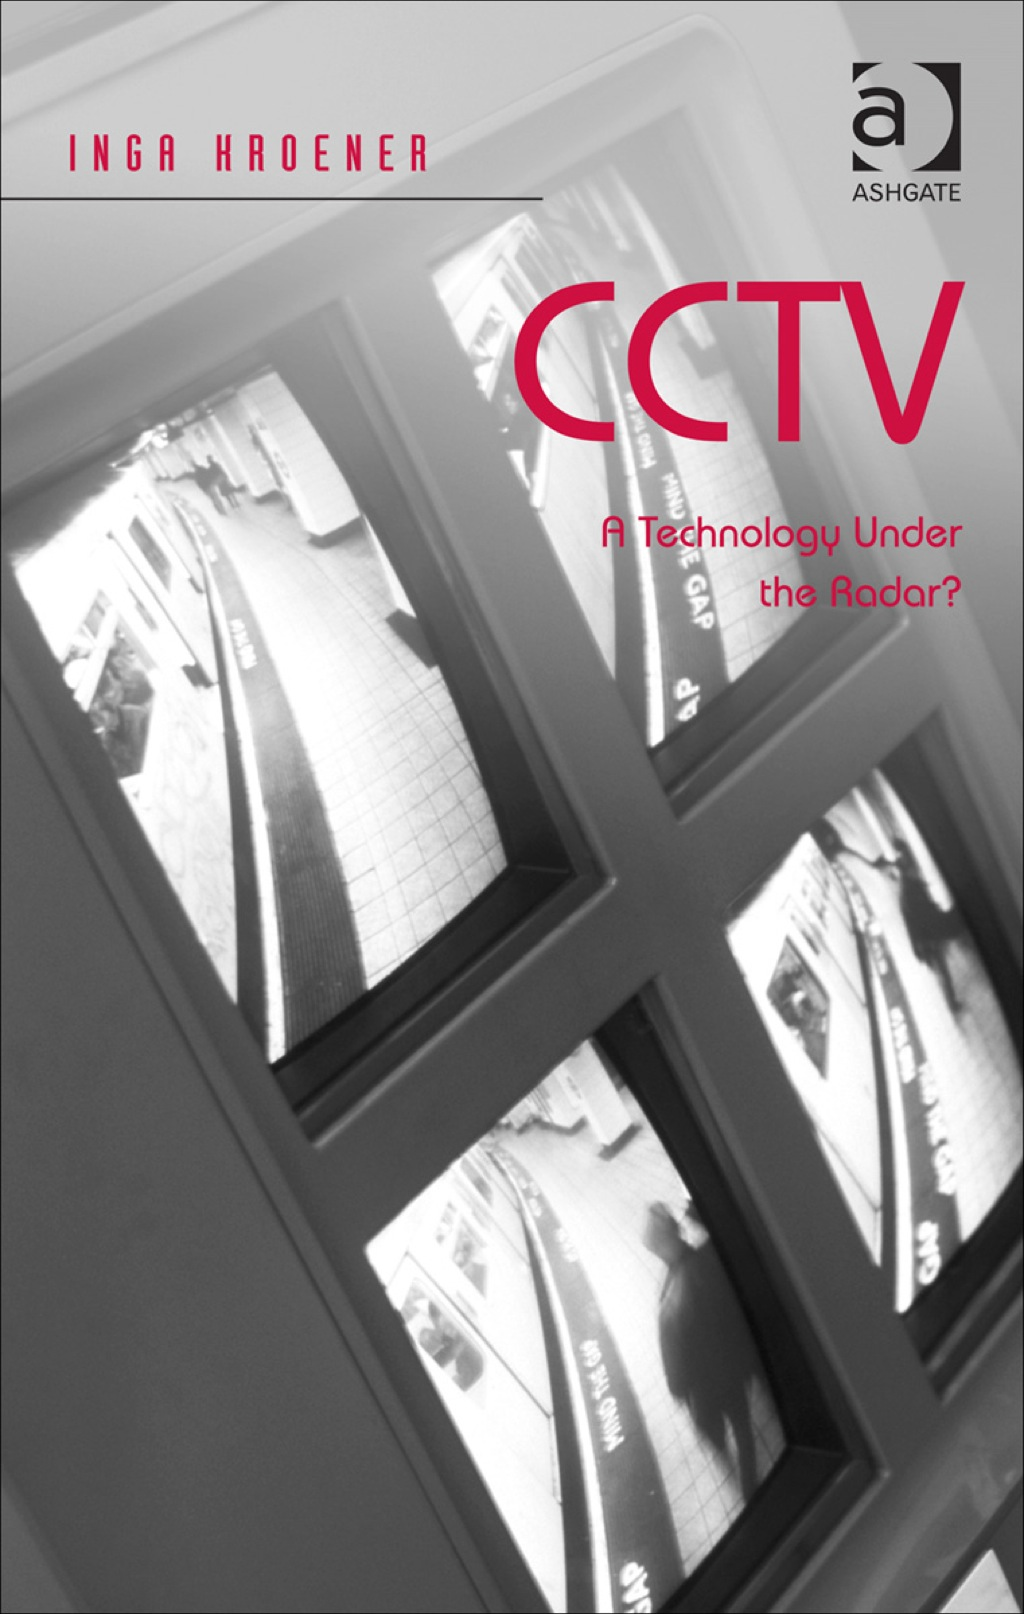 CCTV: A Technology Under the Radar? (eBook Rental)